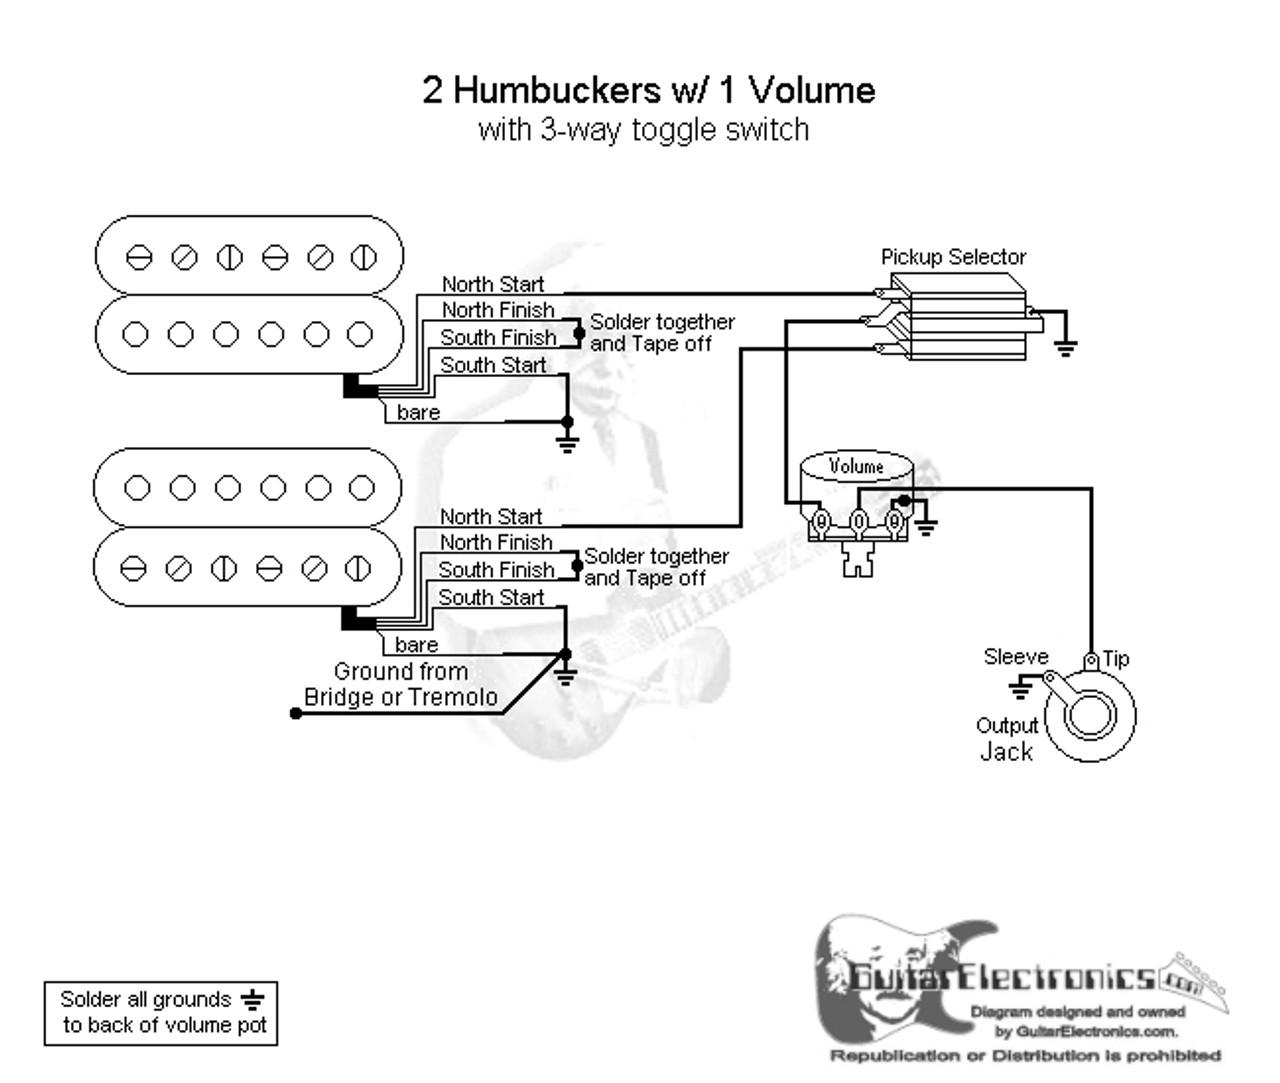 art 320 humbucker wiring diagram owner manual u0026 wiring diagramart 320 humbucker wiring diagram wiring [ 1280 x 1083 Pixel ]